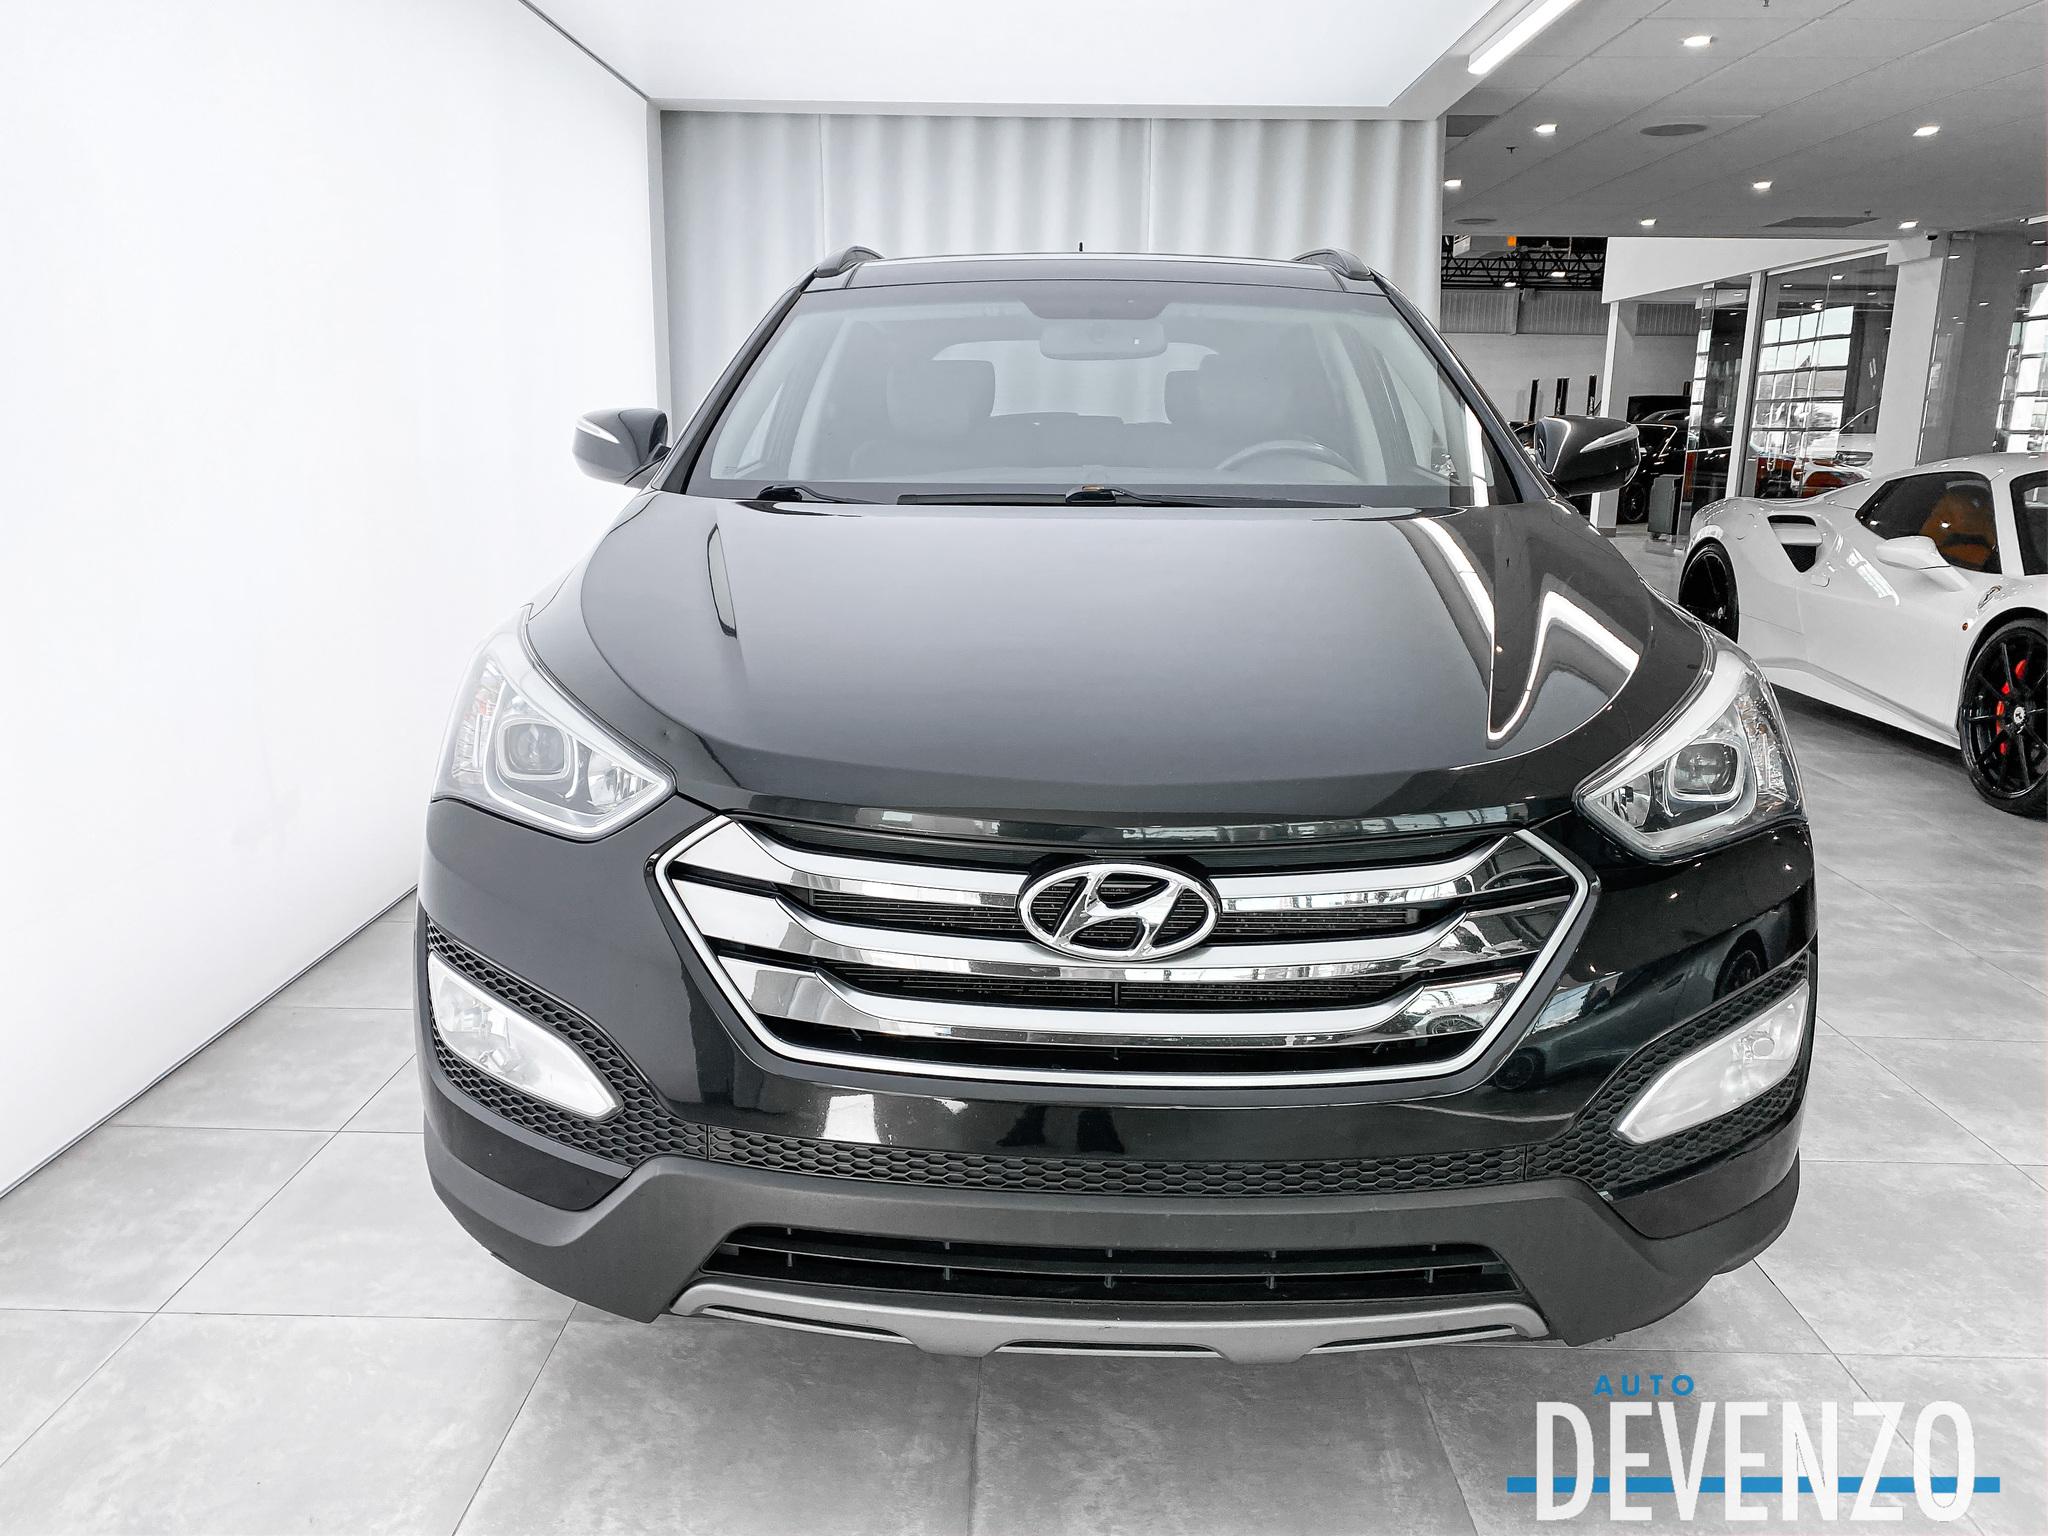 2015 Hyundai Santa Fe Sport SPORT AWD 2.4L Luxury CUIR TOIT PANORAMIQUE complet